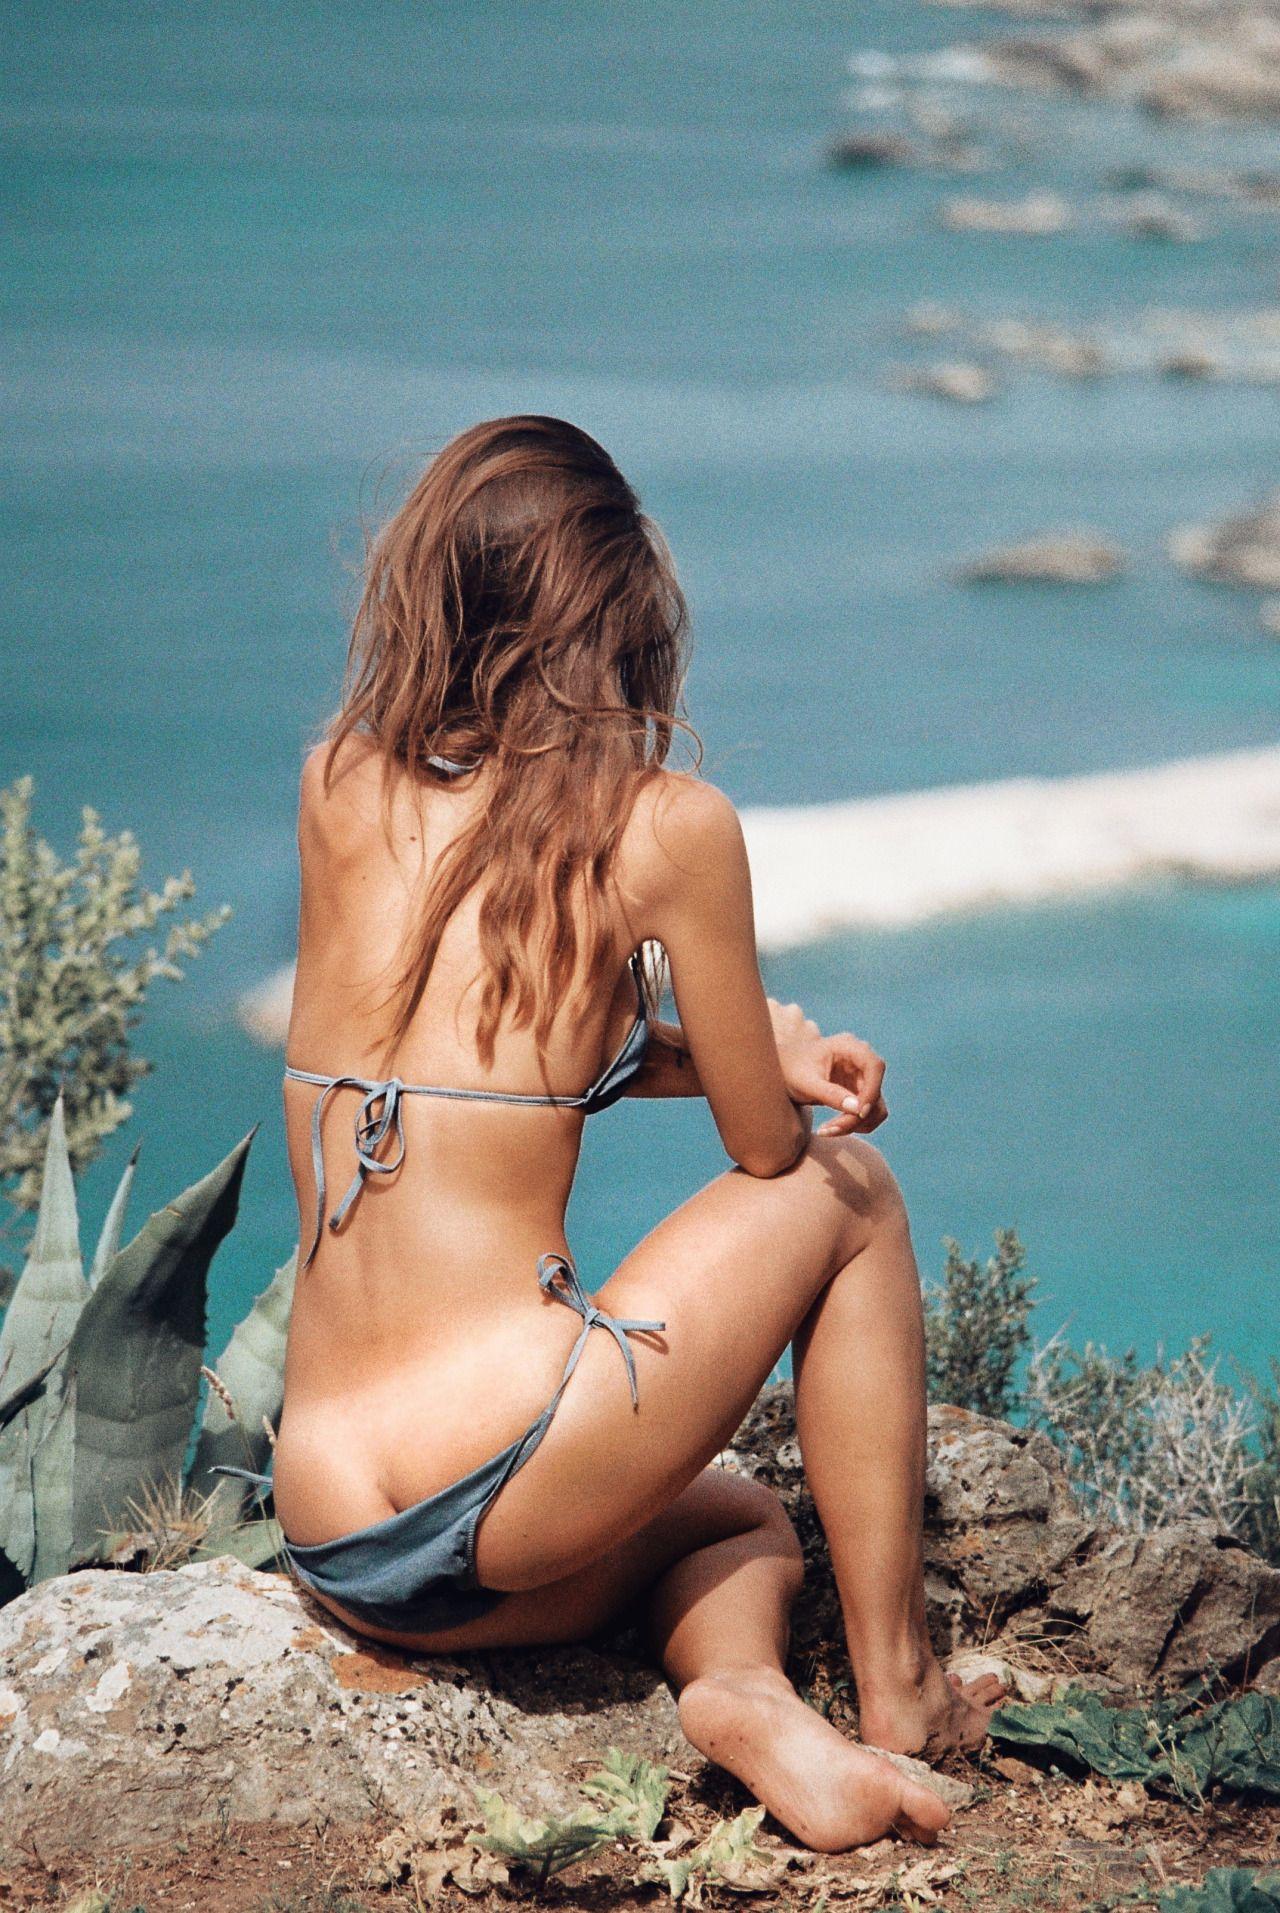 Valeriya-Volkova-Topless-Bikini-13